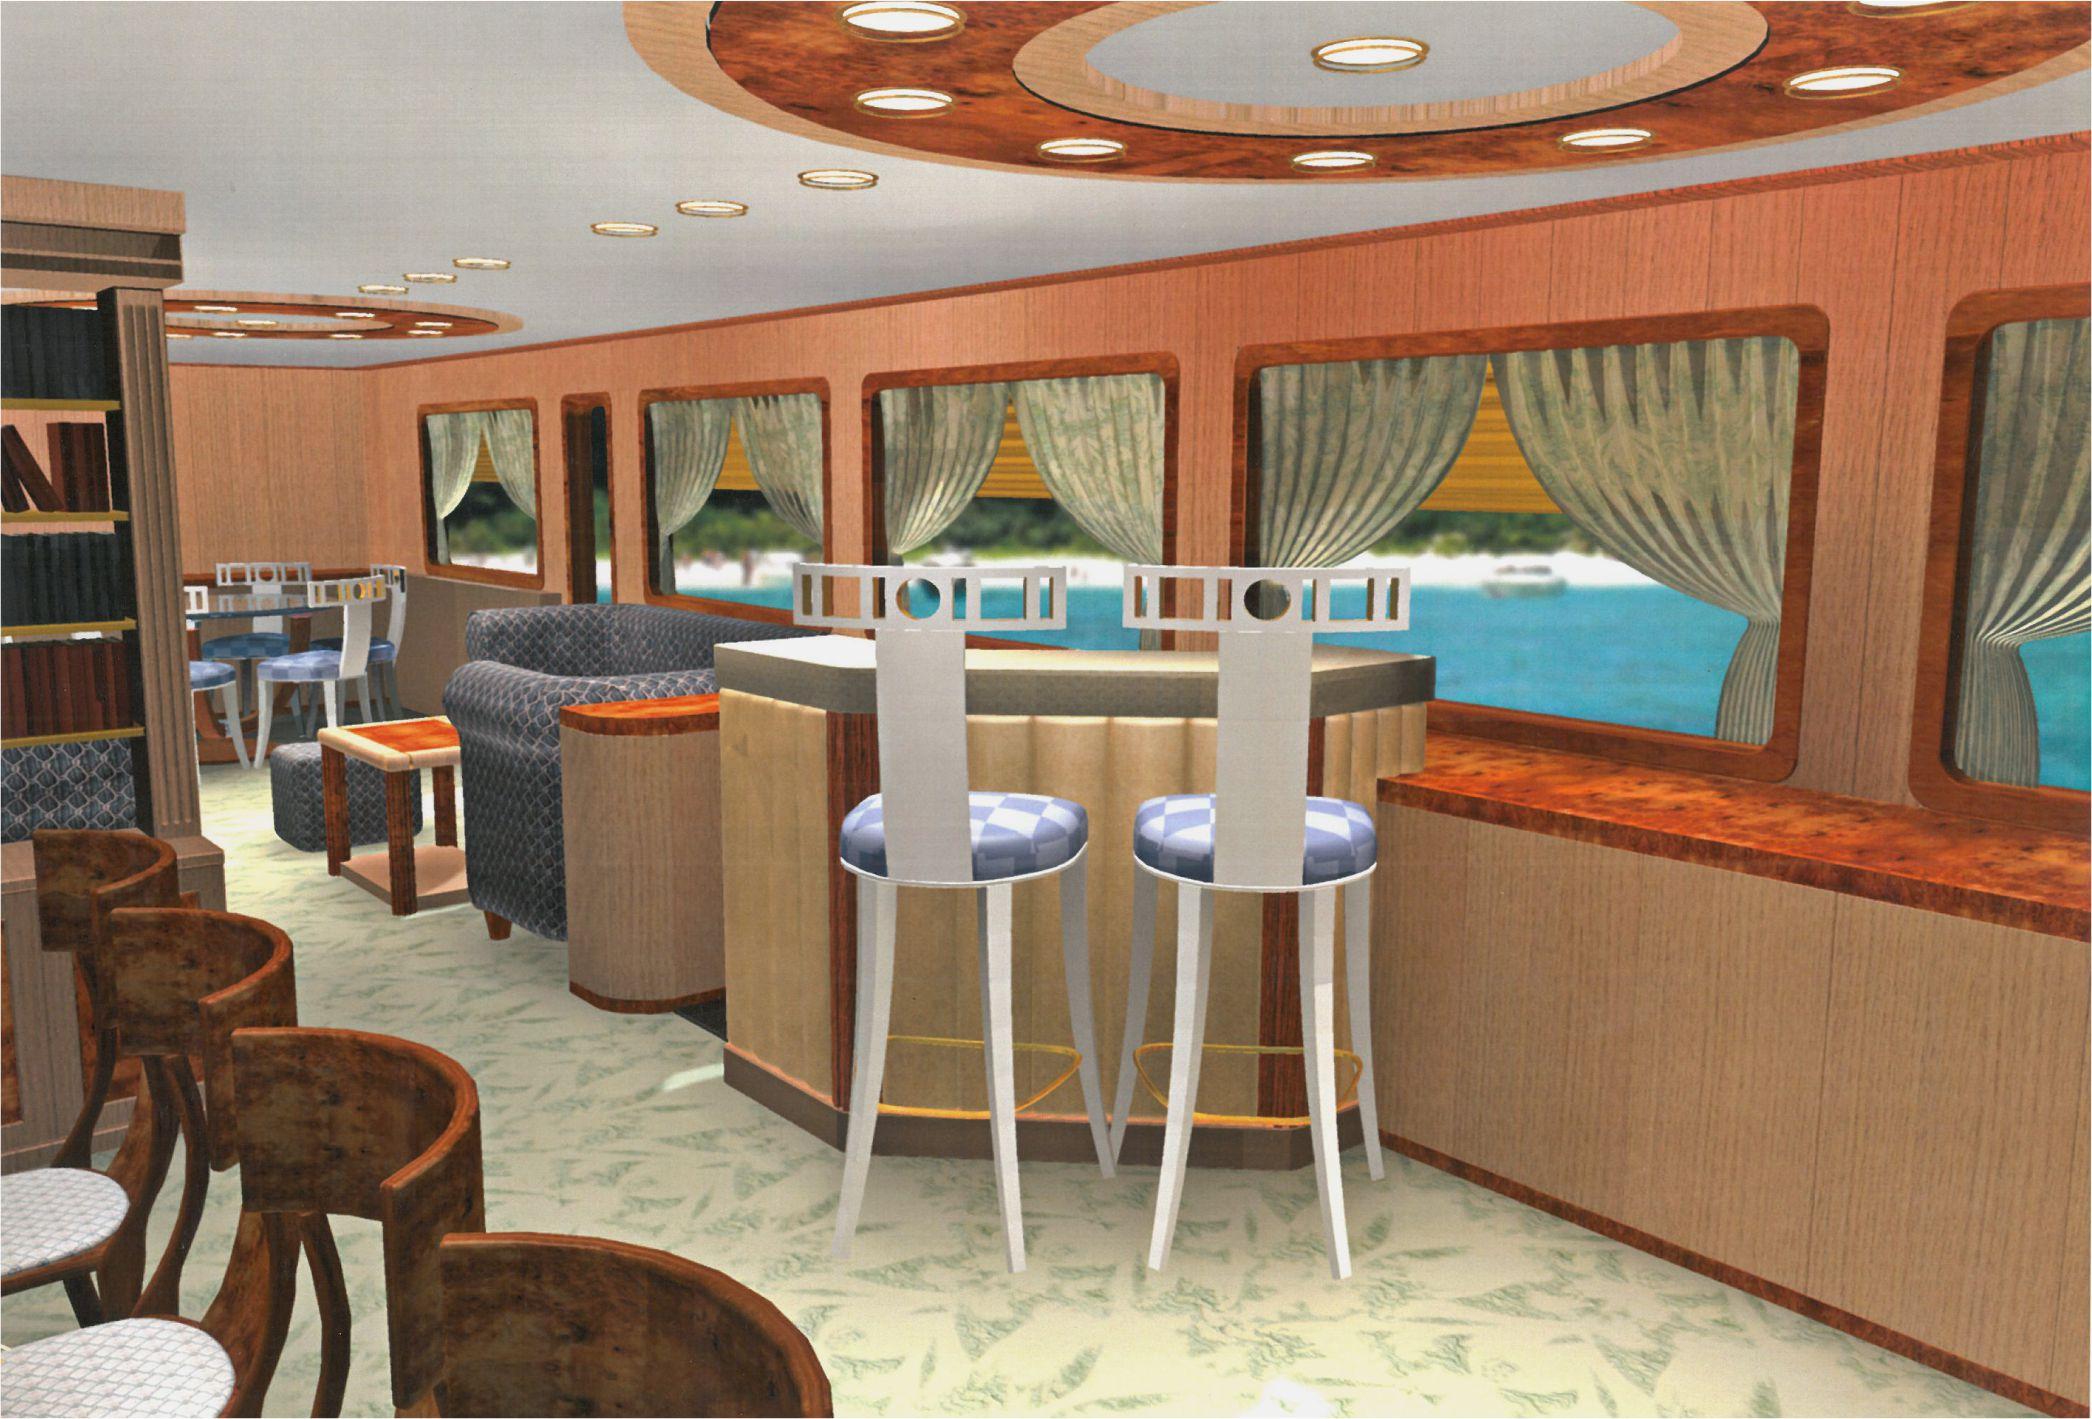 Paraskevi-interior-design-boat-3